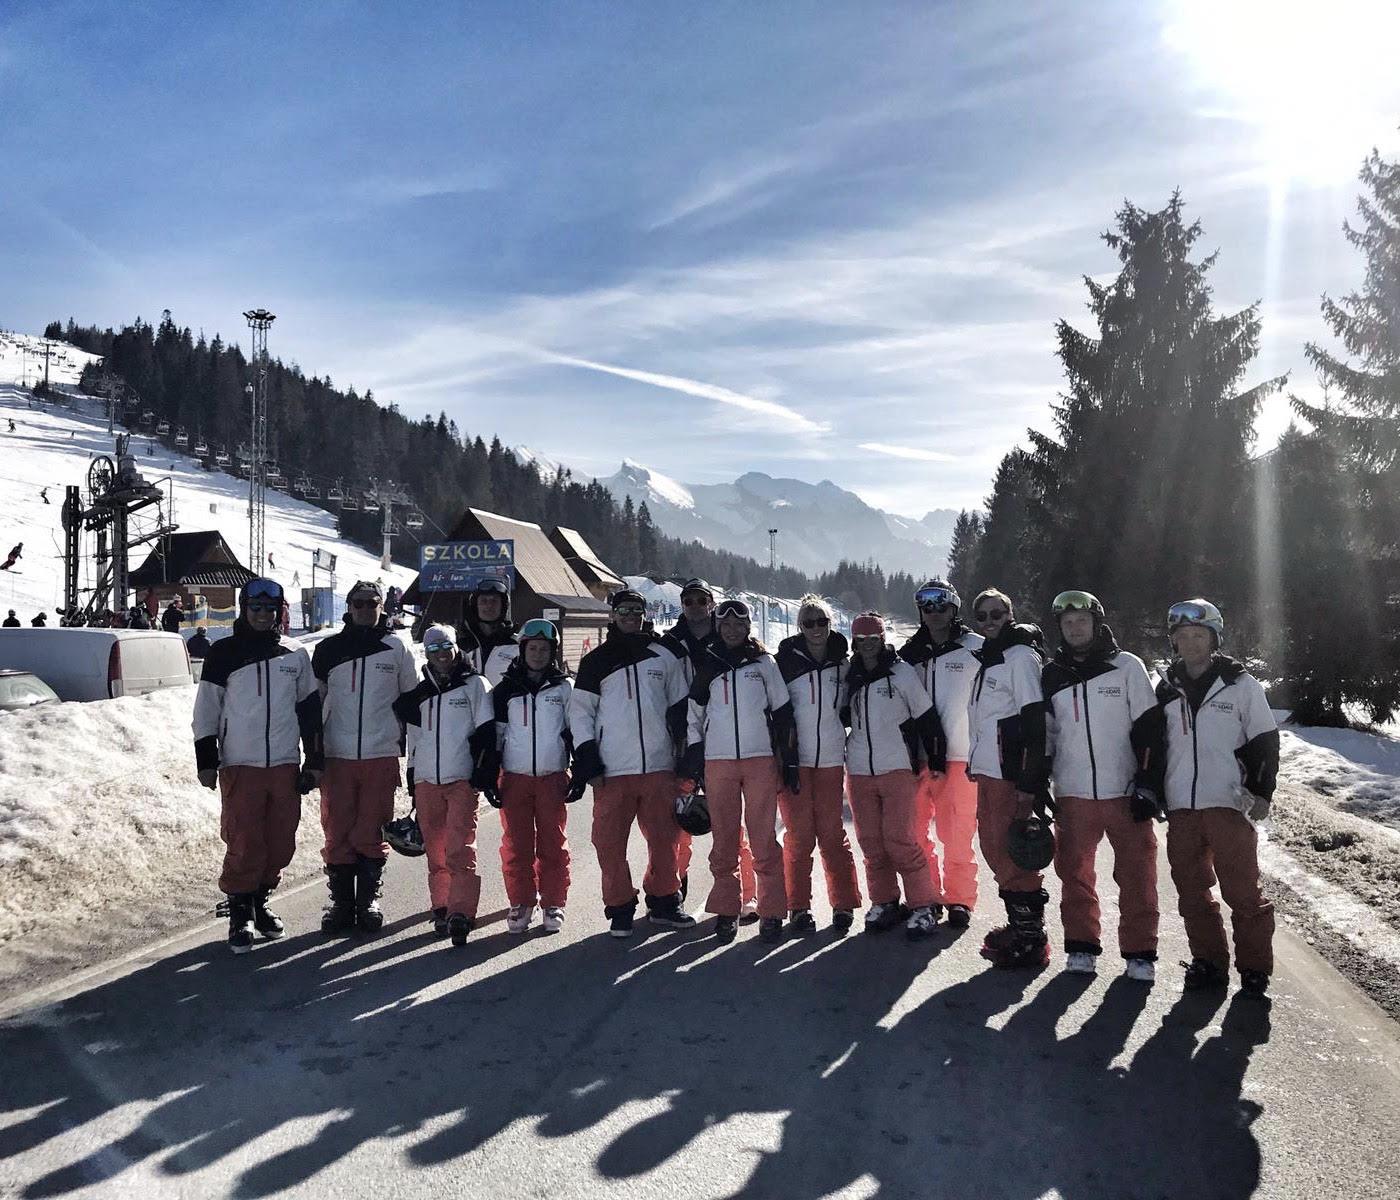 White Side Holidays Poland, Ski and Snowboard Instructors in Zakopane